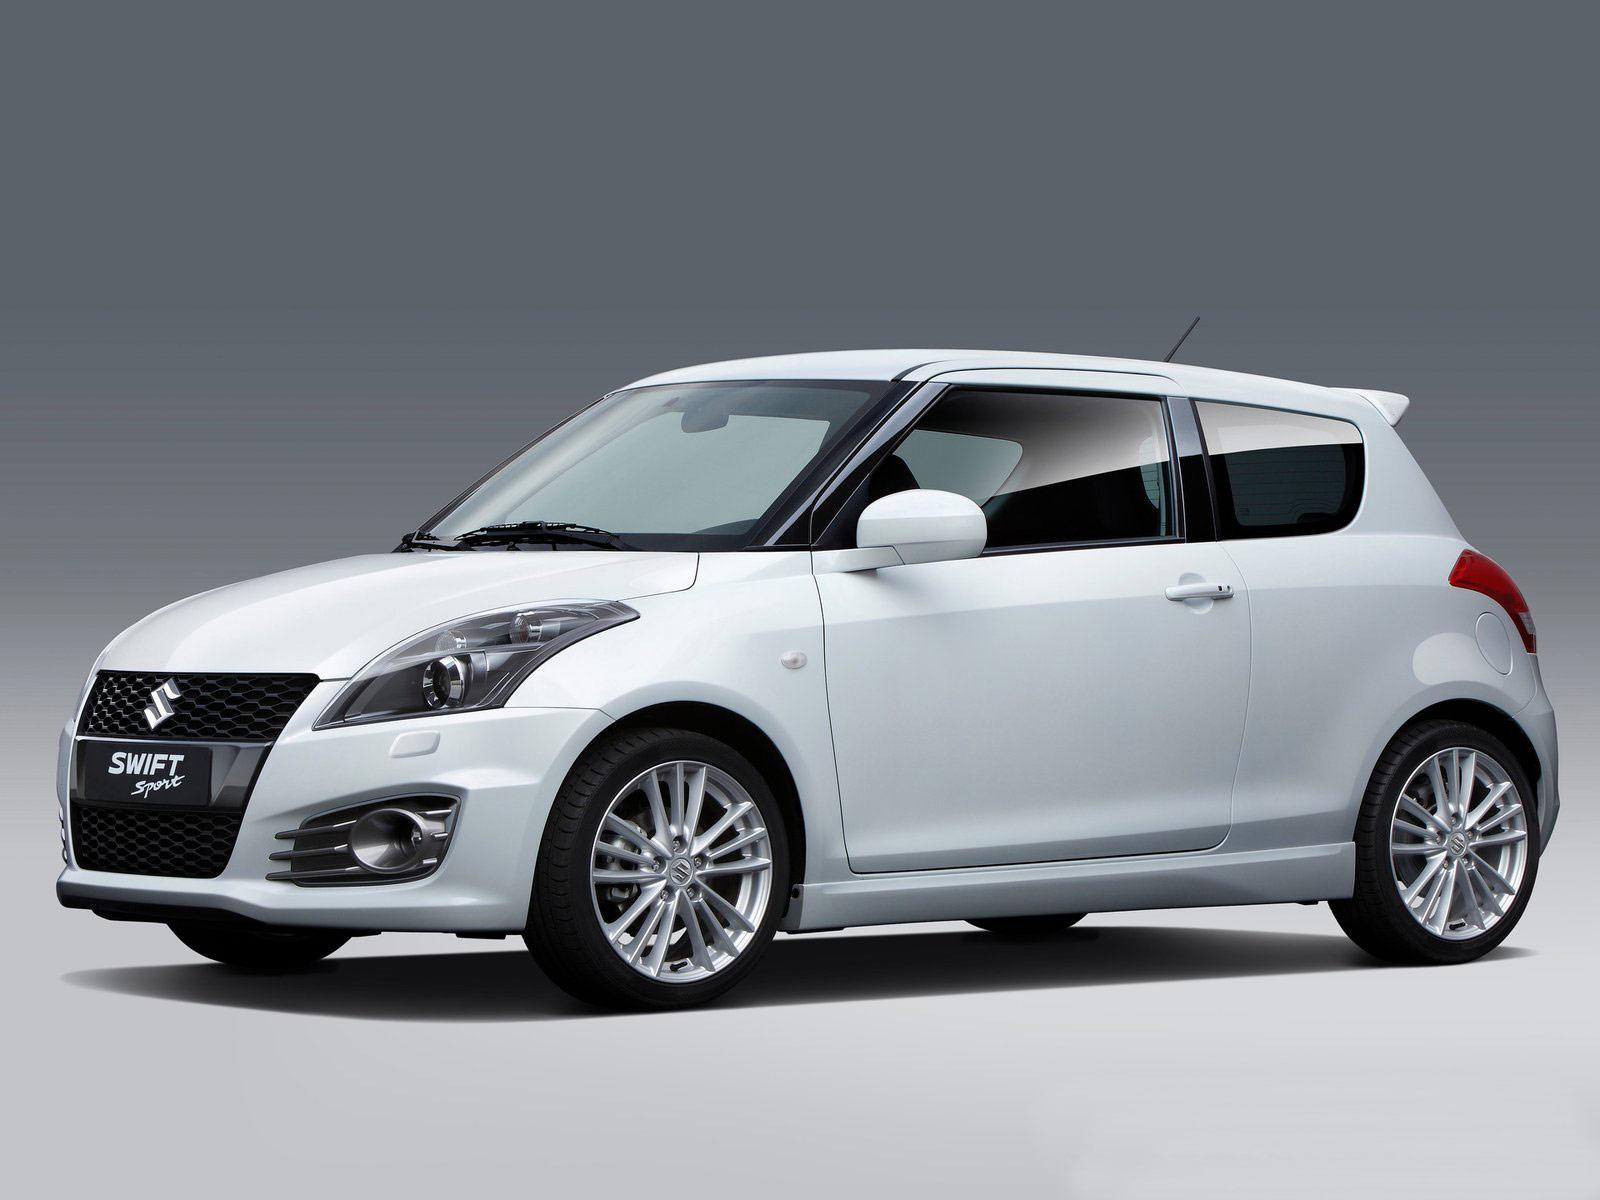 japanese car photos 2012 suzuki swift sport. Black Bedroom Furniture Sets. Home Design Ideas